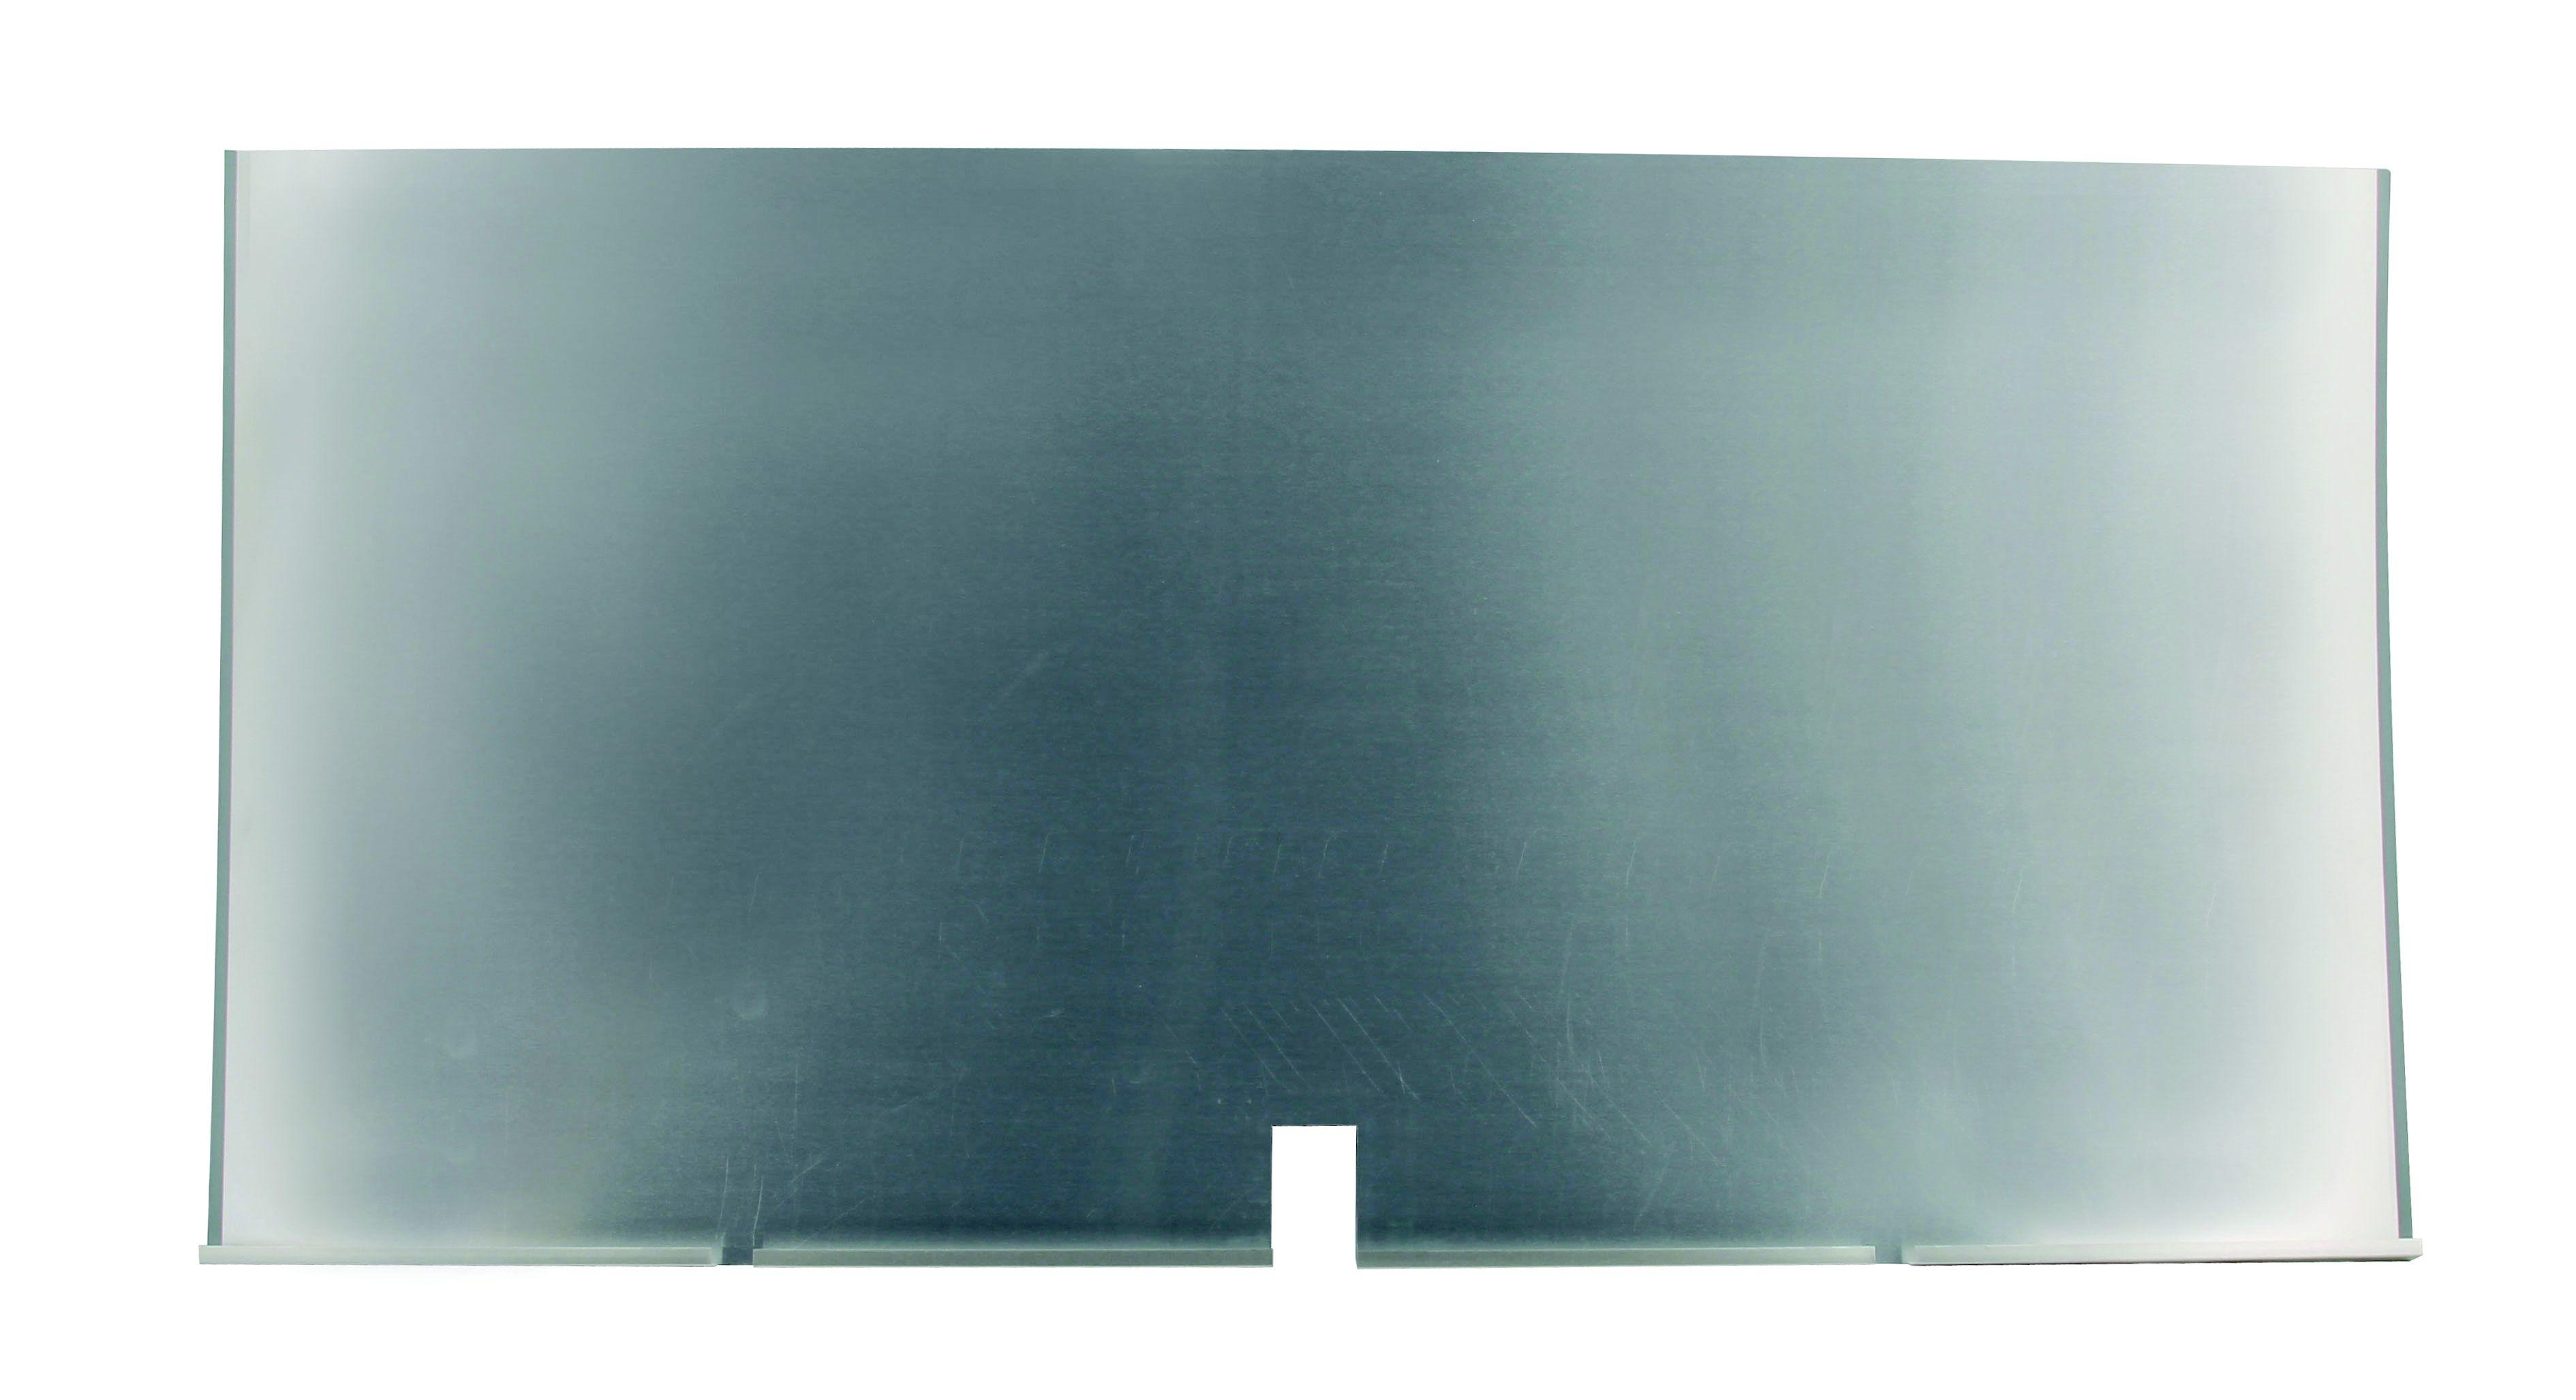 premium kitchens stainless steel effect sink liner departments